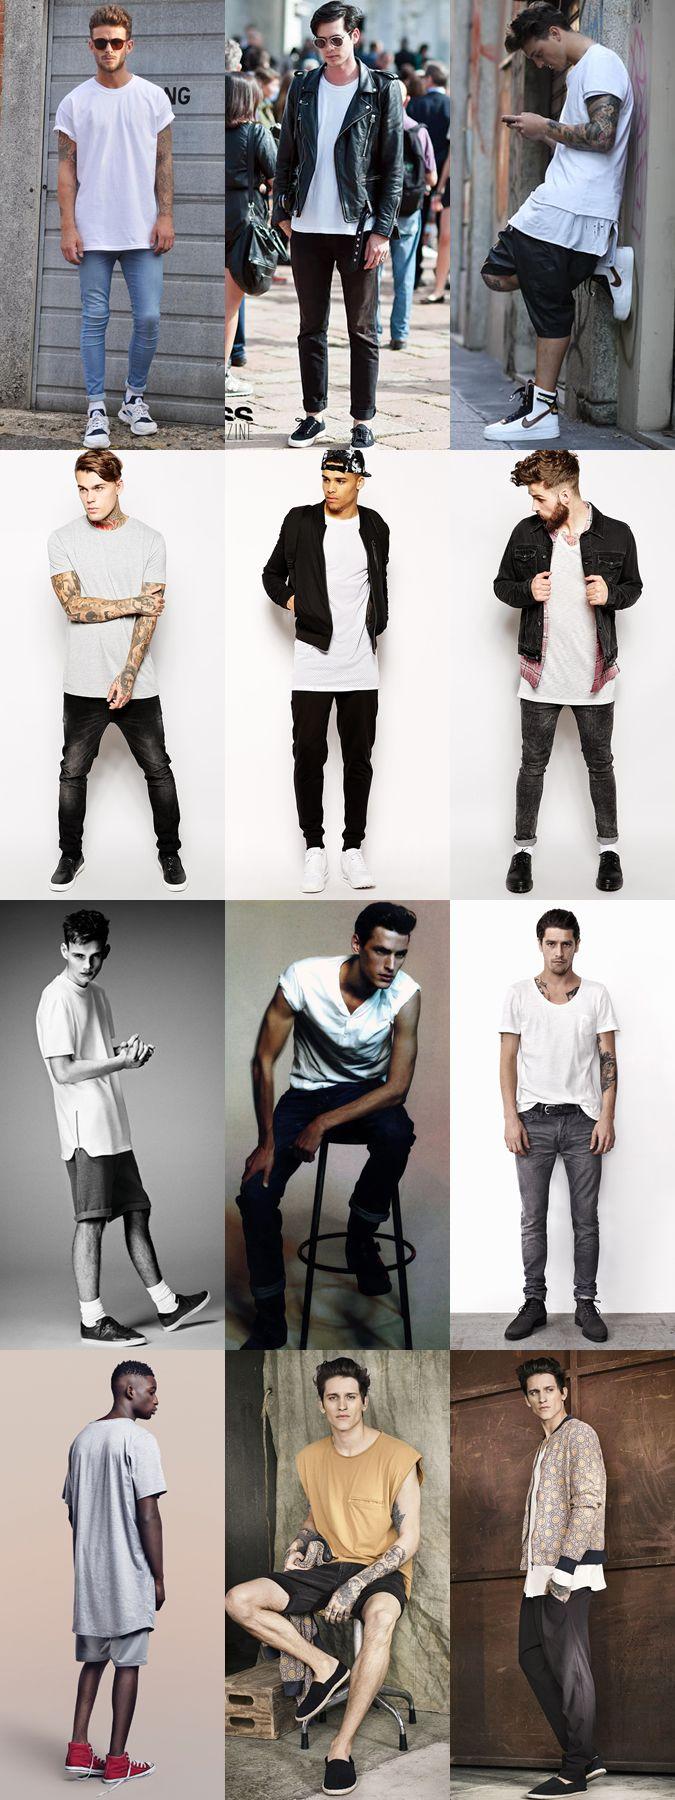 Men's Summer Daring Fashion Trends: The Oversized Tee Lookbook Inspiration